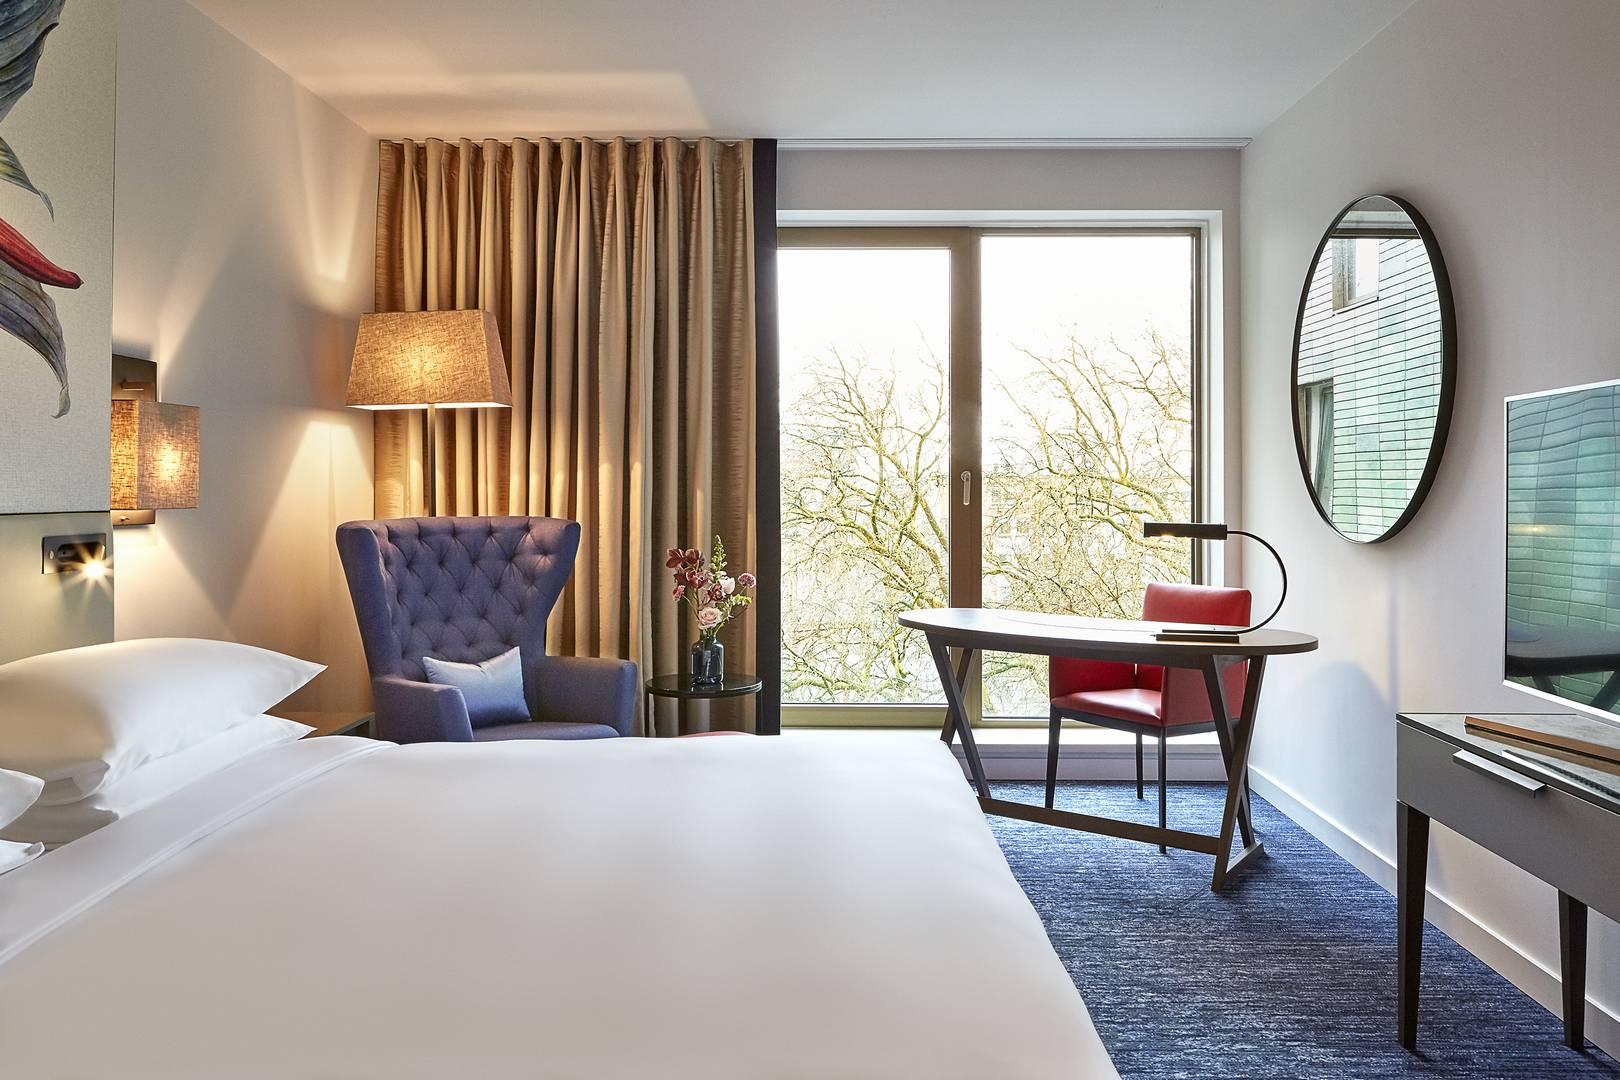 Hyatt Regency Hotel Amsterdam